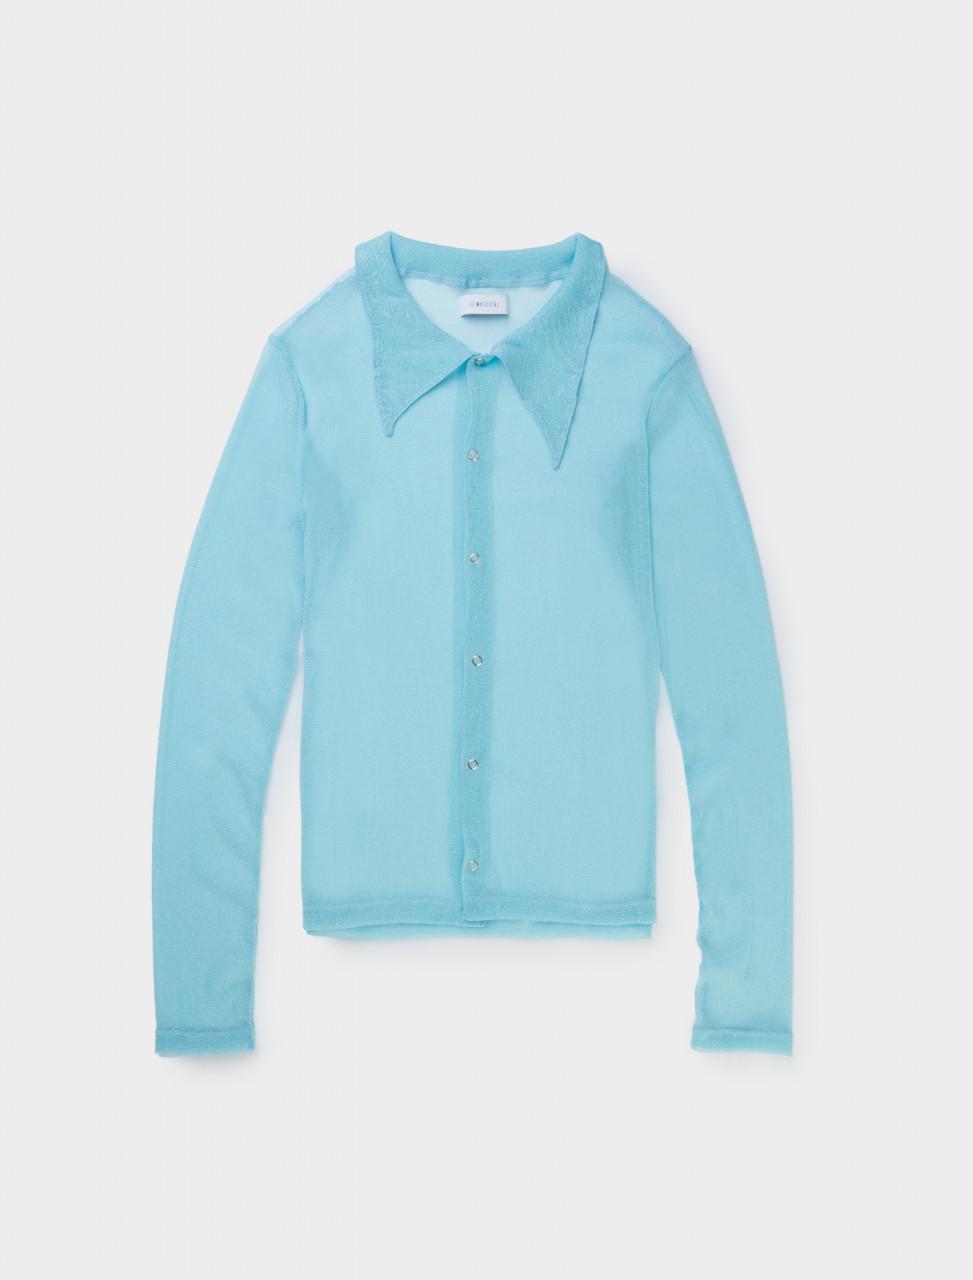 LAZOSCHMIDL Semi Sheer Amanda Button Up Shirt in Blue